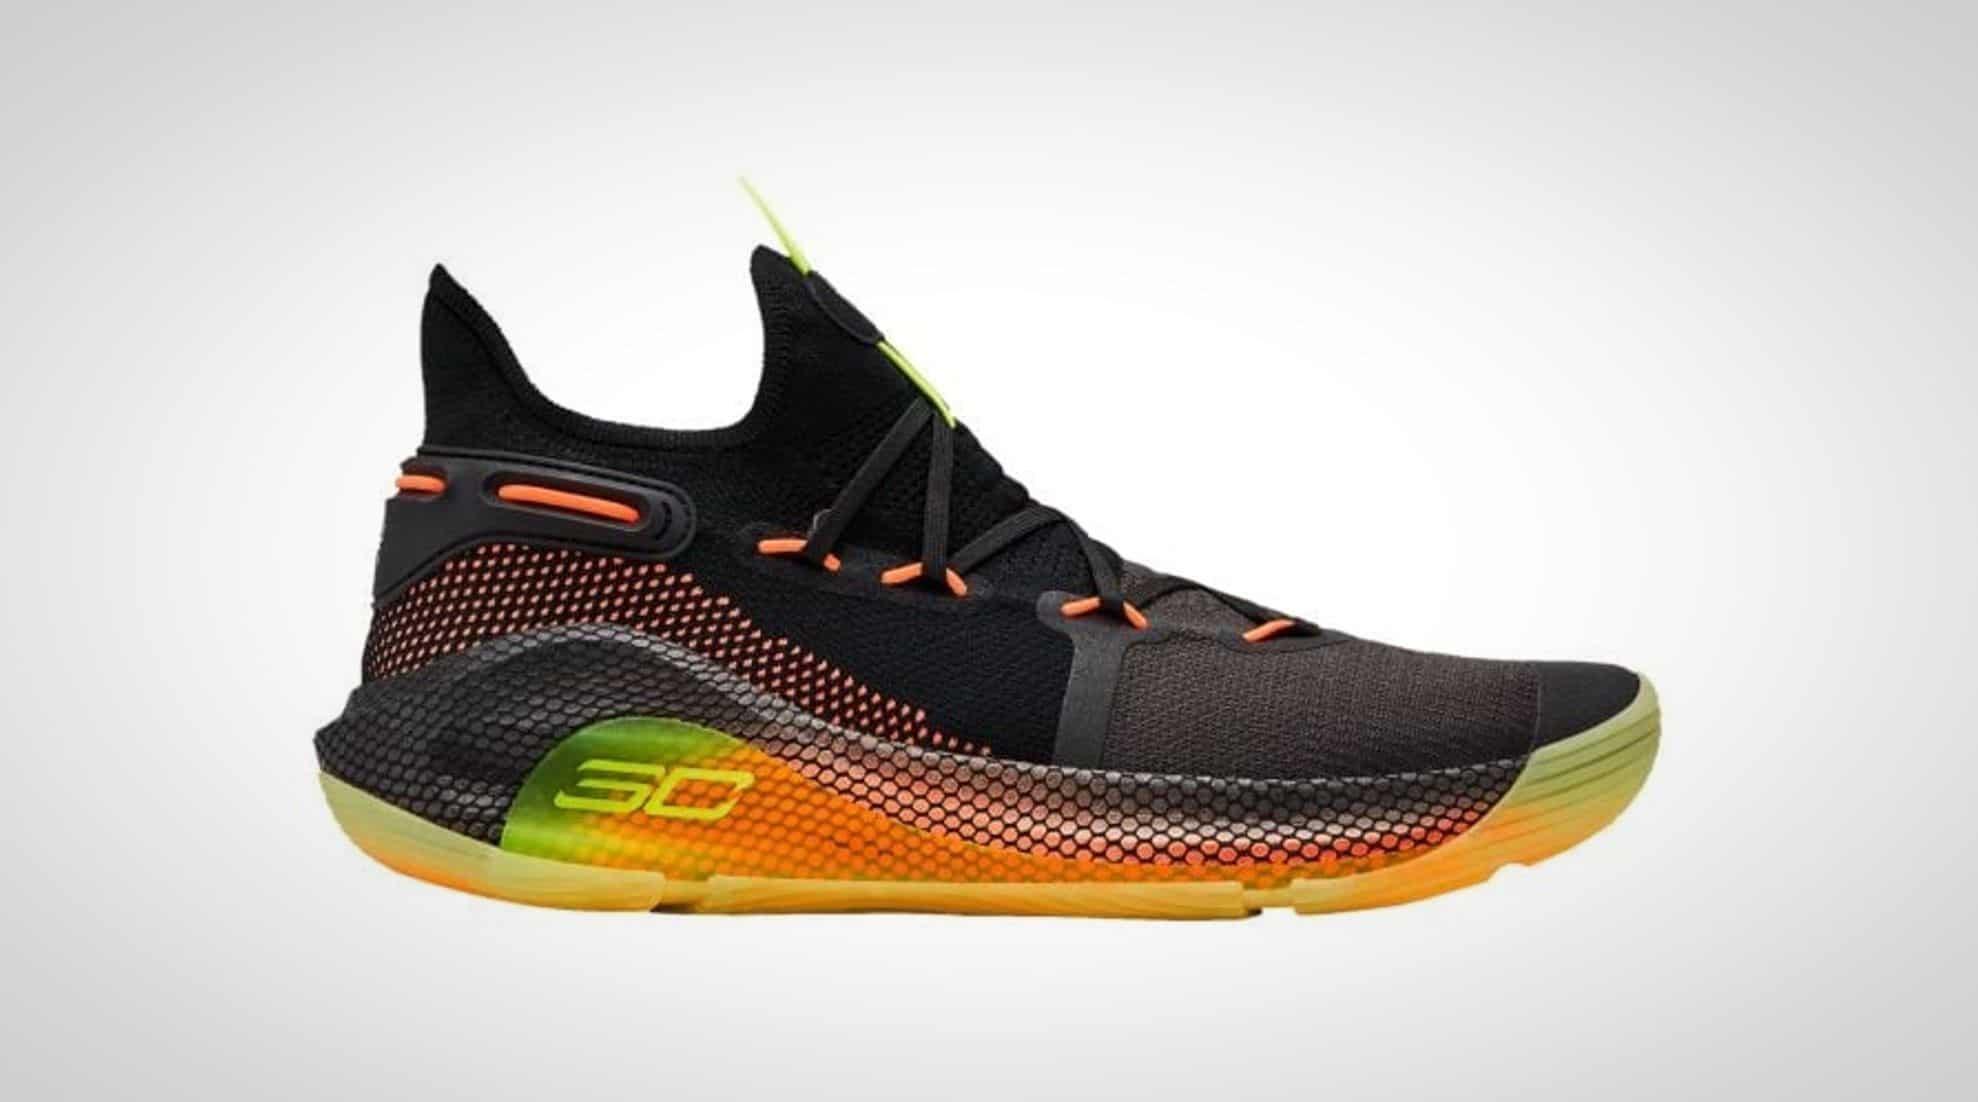 e5526c46dae7 Under Armour Curry 6 Shoe Review - BestOutdoorBasketball